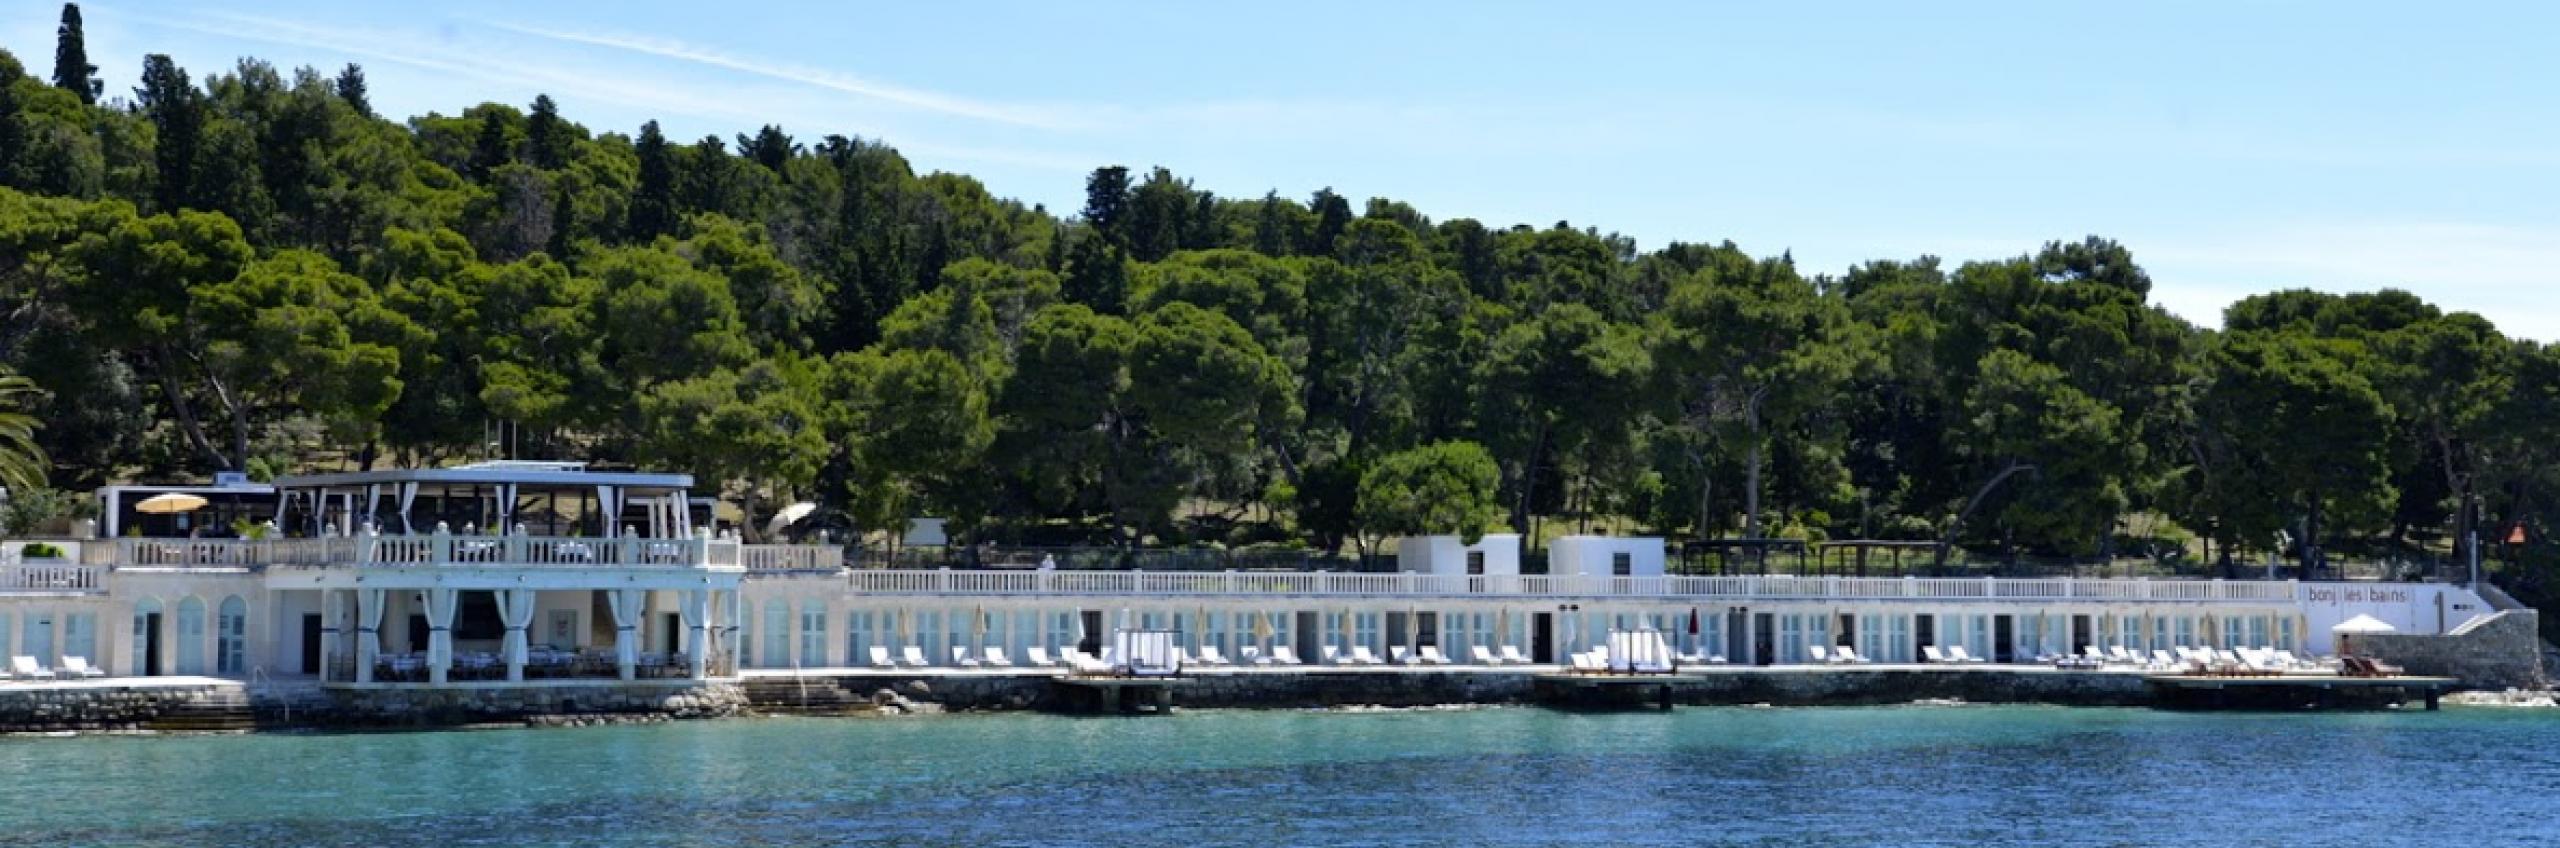 Alugueres de praia Bonj 'les bains'